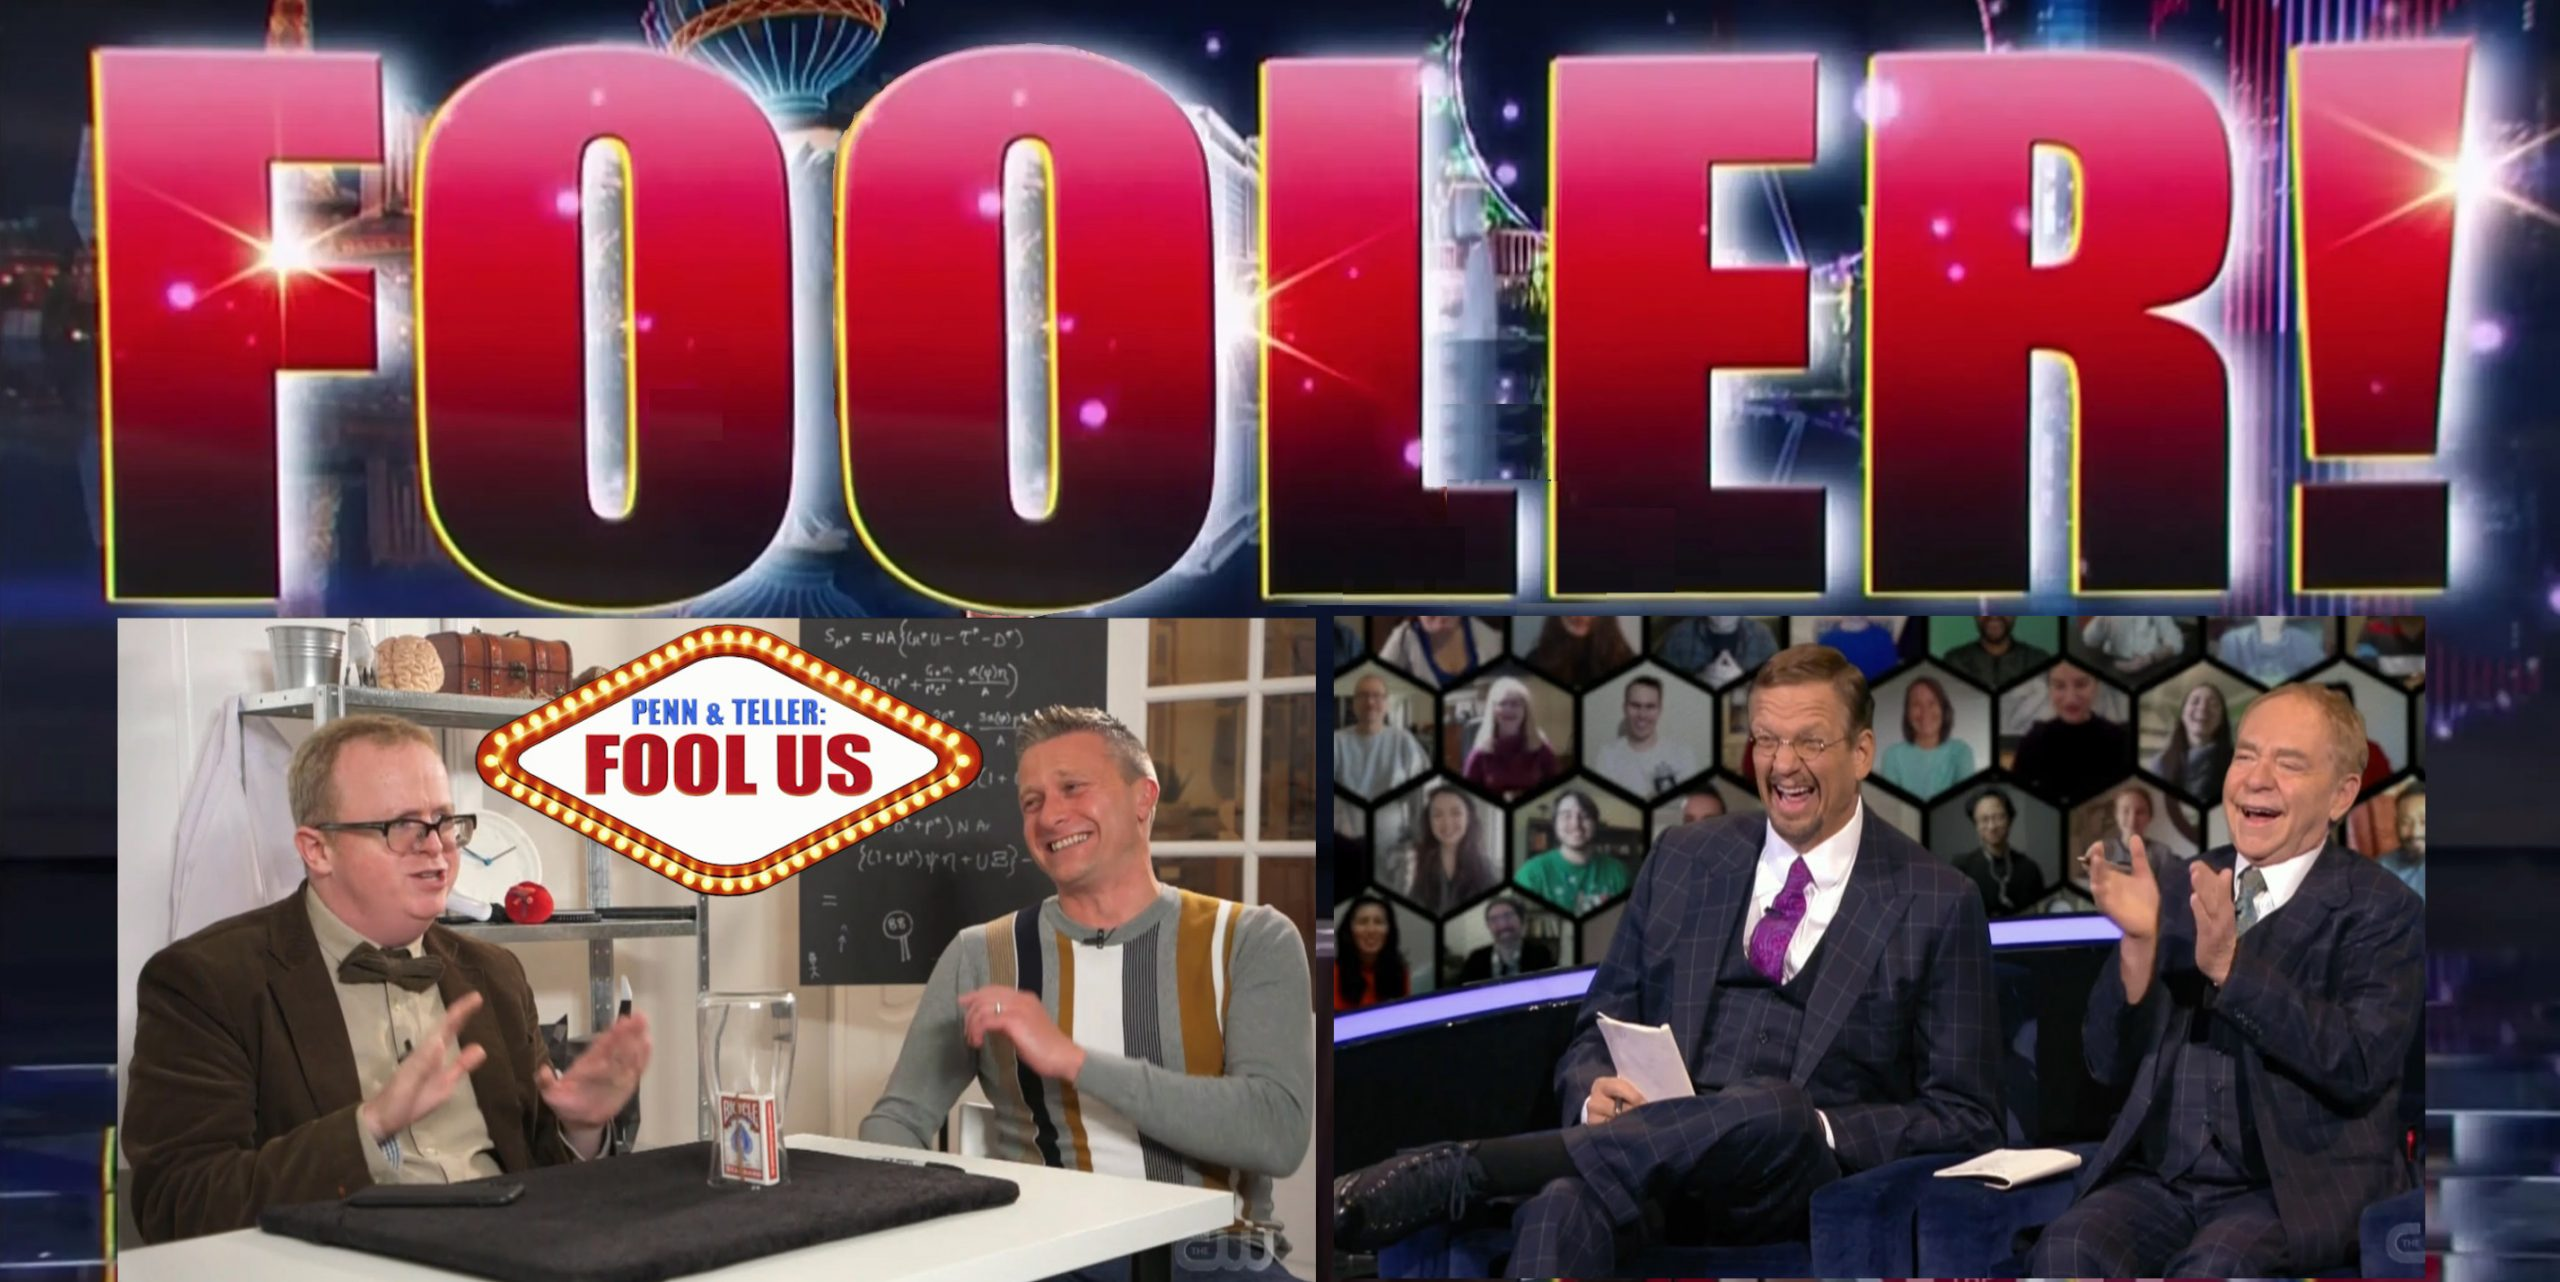 Noel-Qualter-Fools-Penn-&-Teller